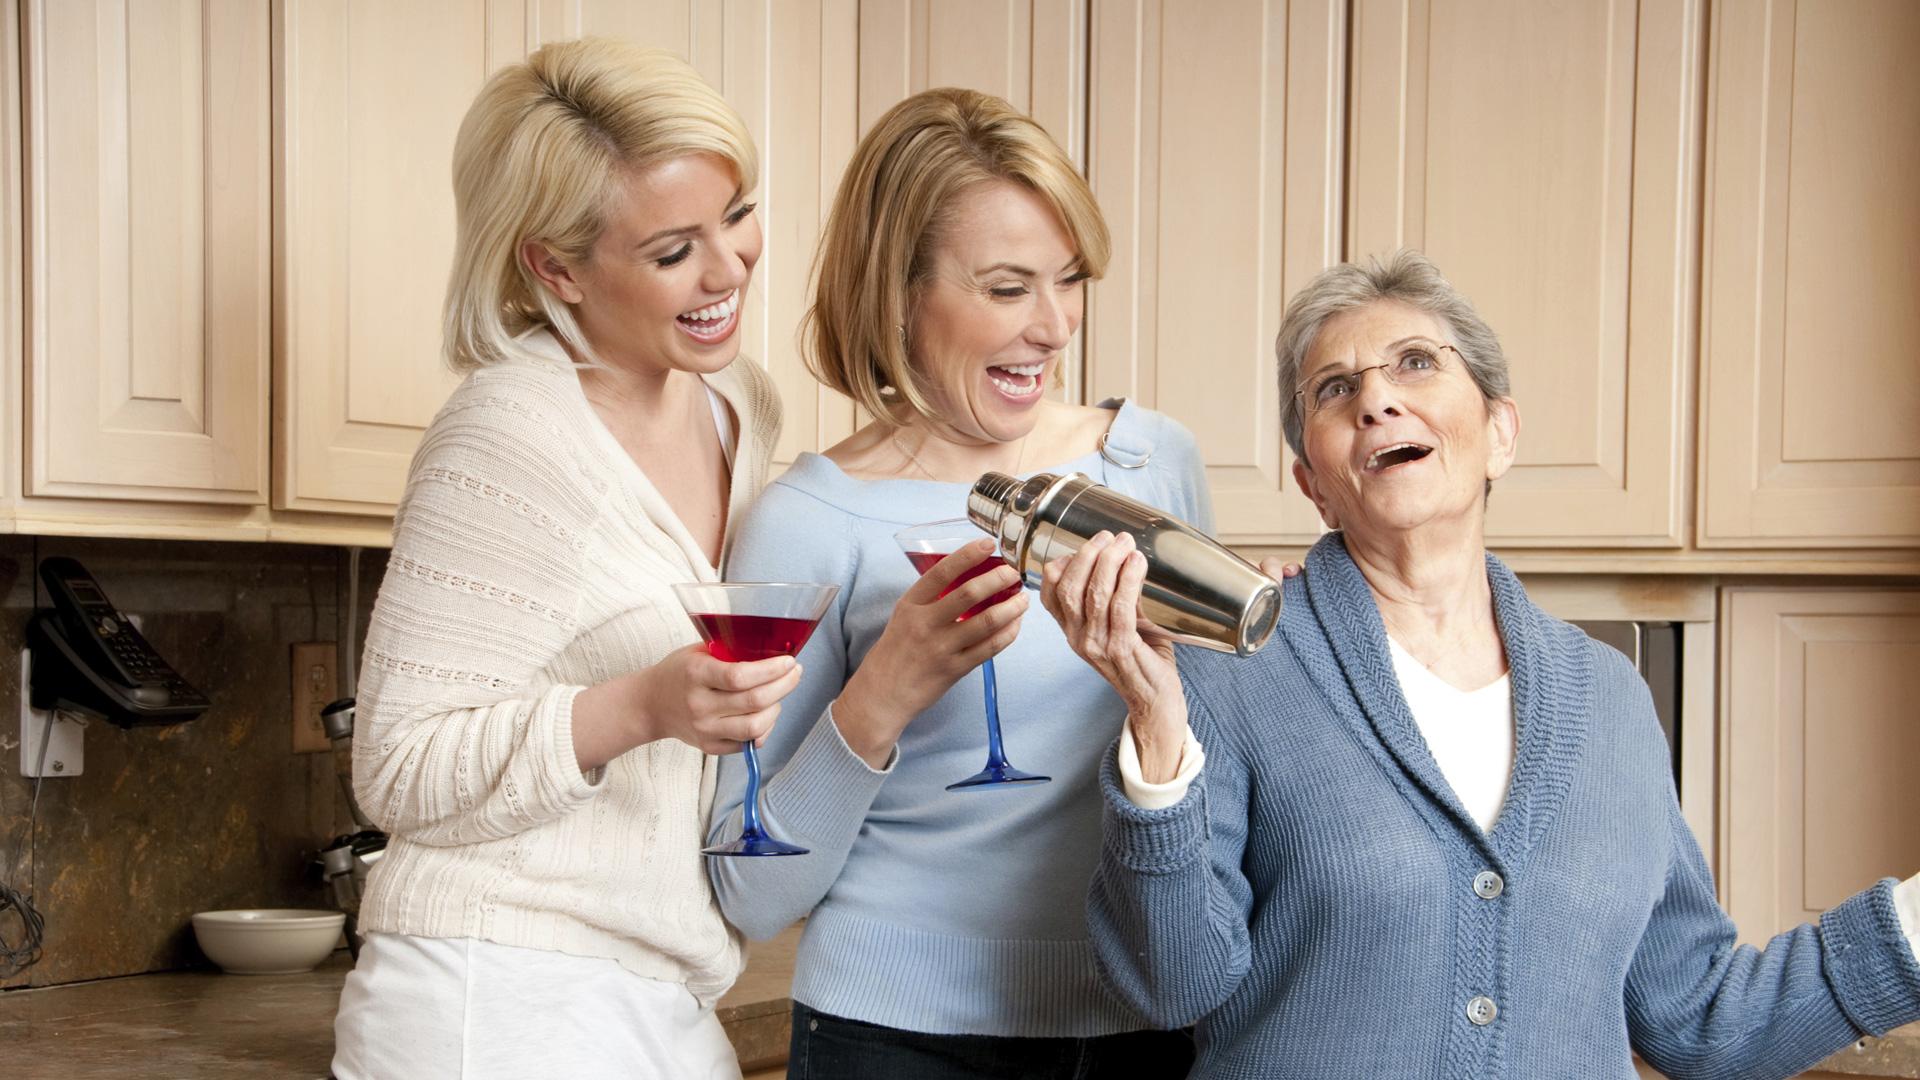 Surprise-Her-with-Her-favorite-Flavor-Wine-Bottle